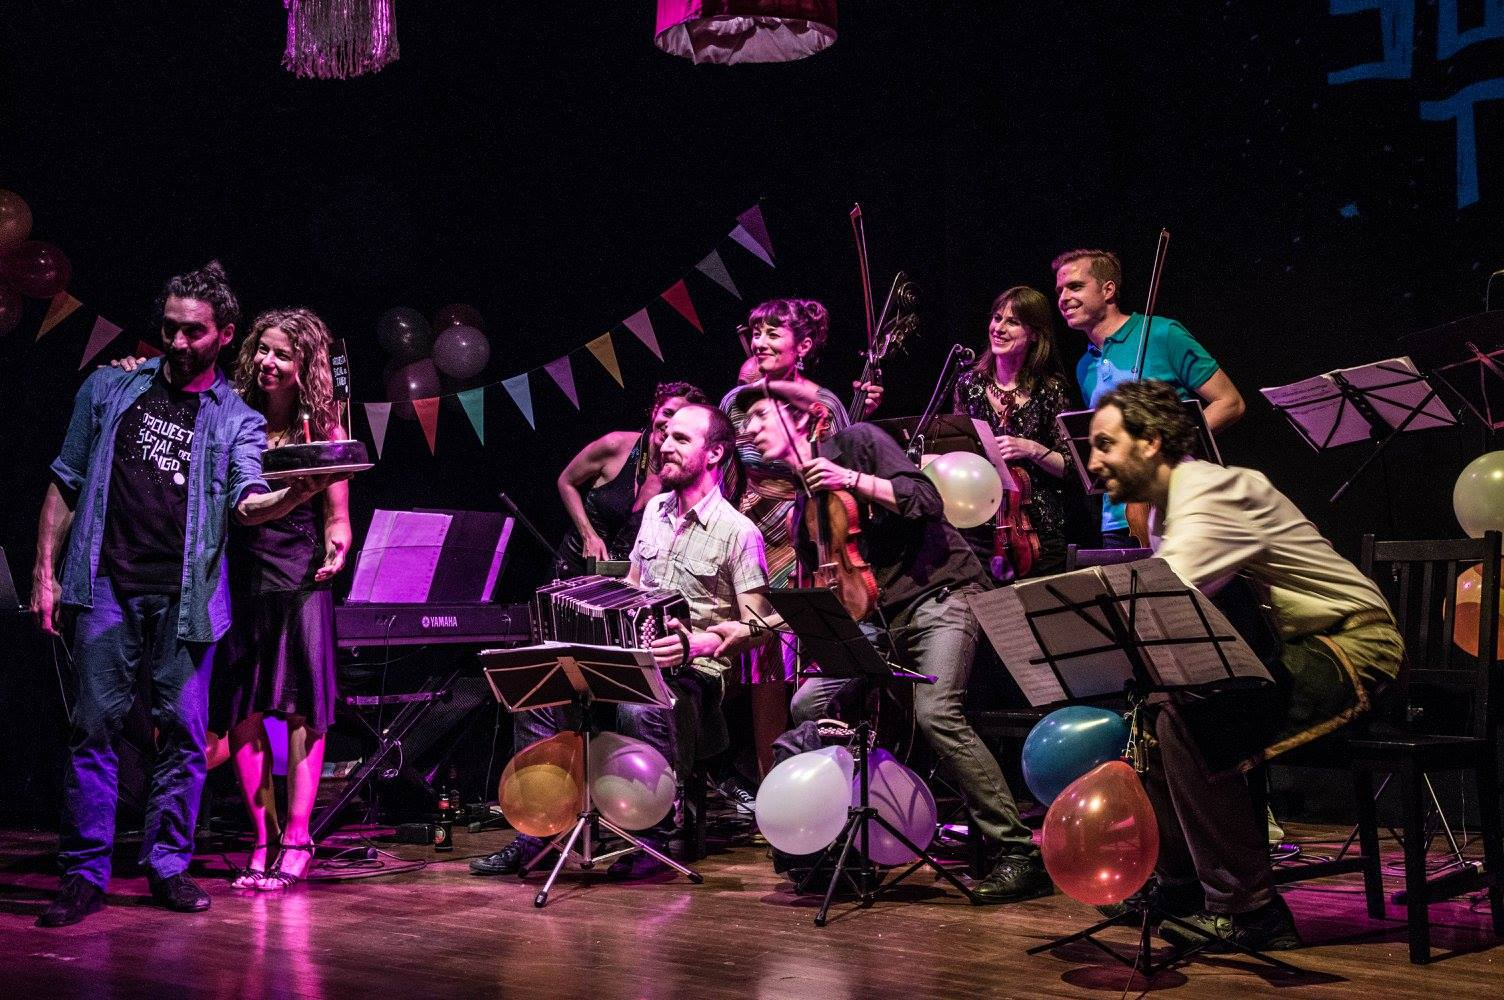 Happy Birthday Orquesta!